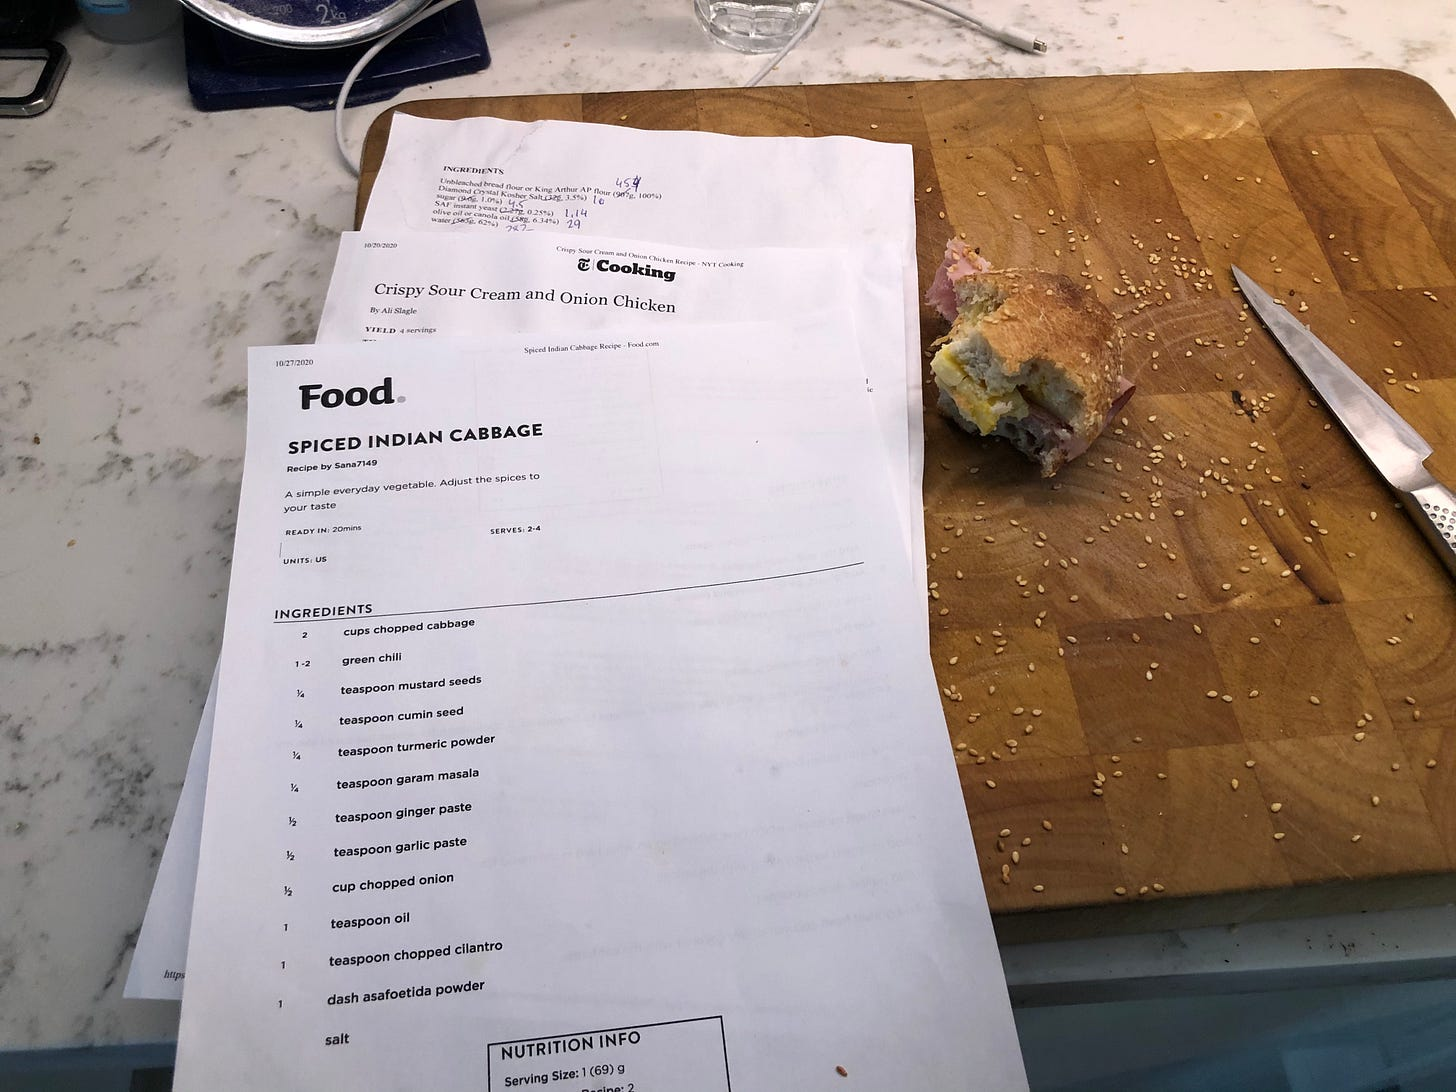 Printouts of various recipes